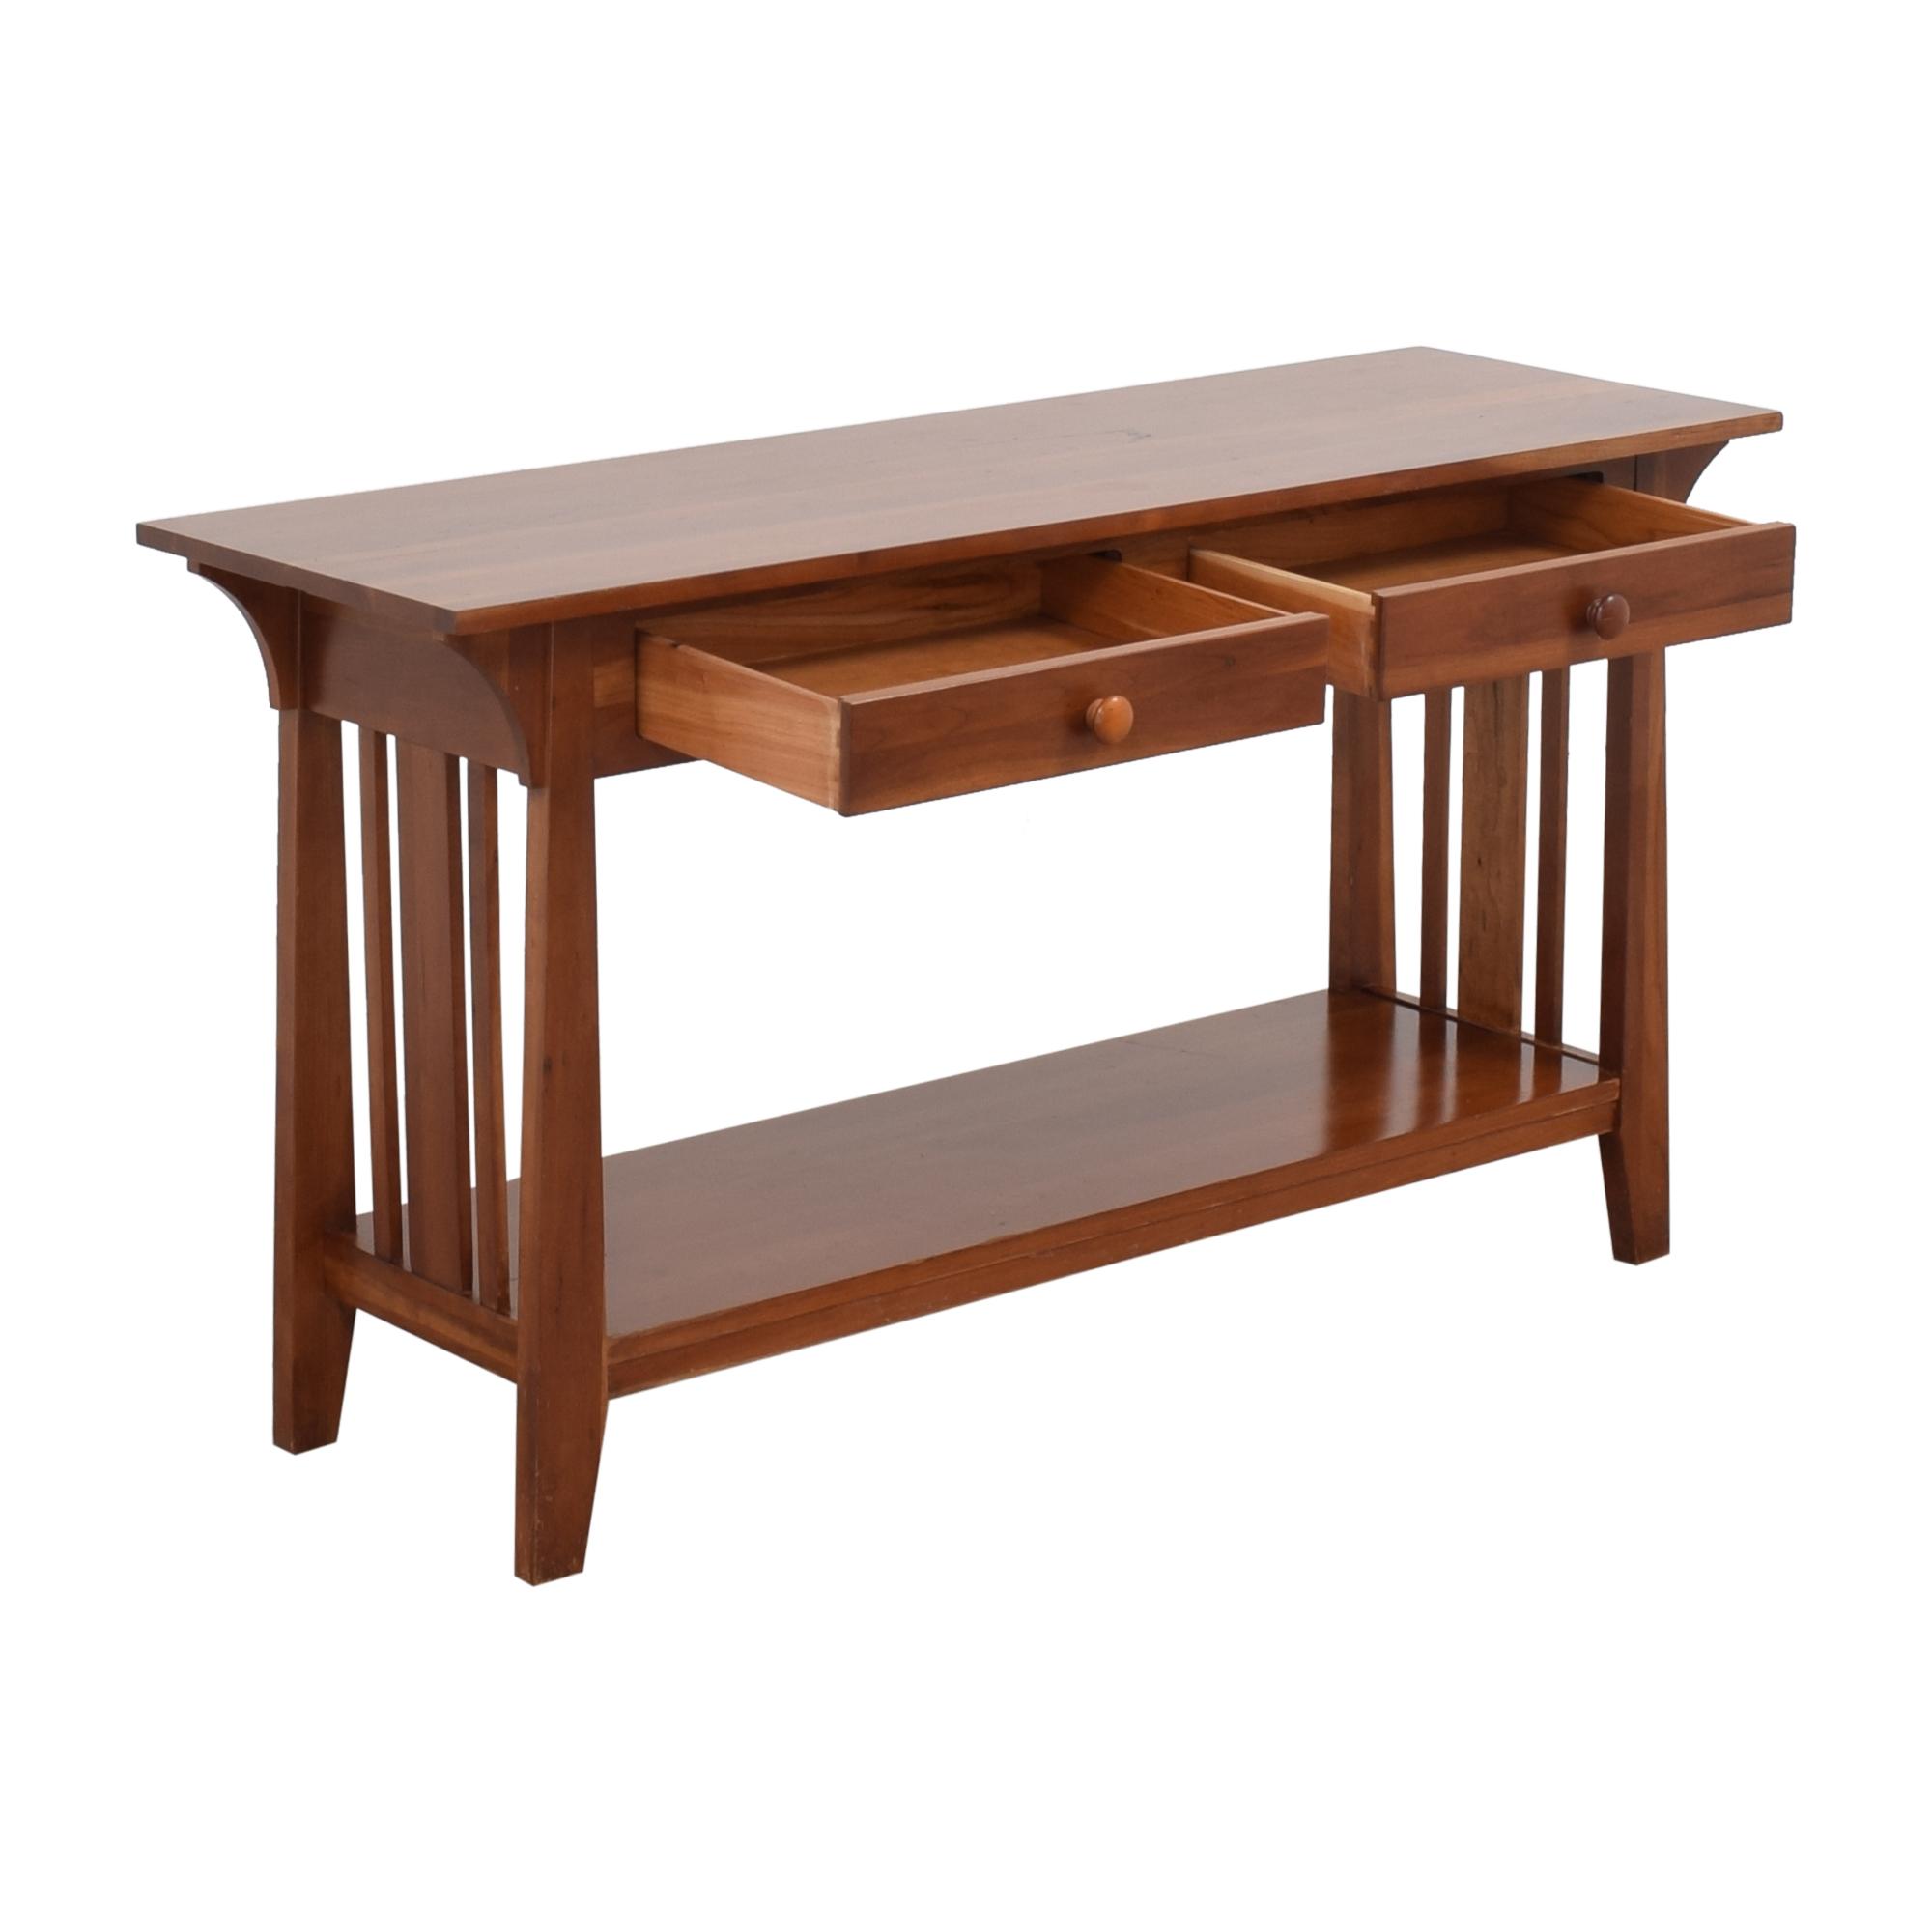 buy Ethan Allen Peter Sofa Table Ethan Allen Accent Tables